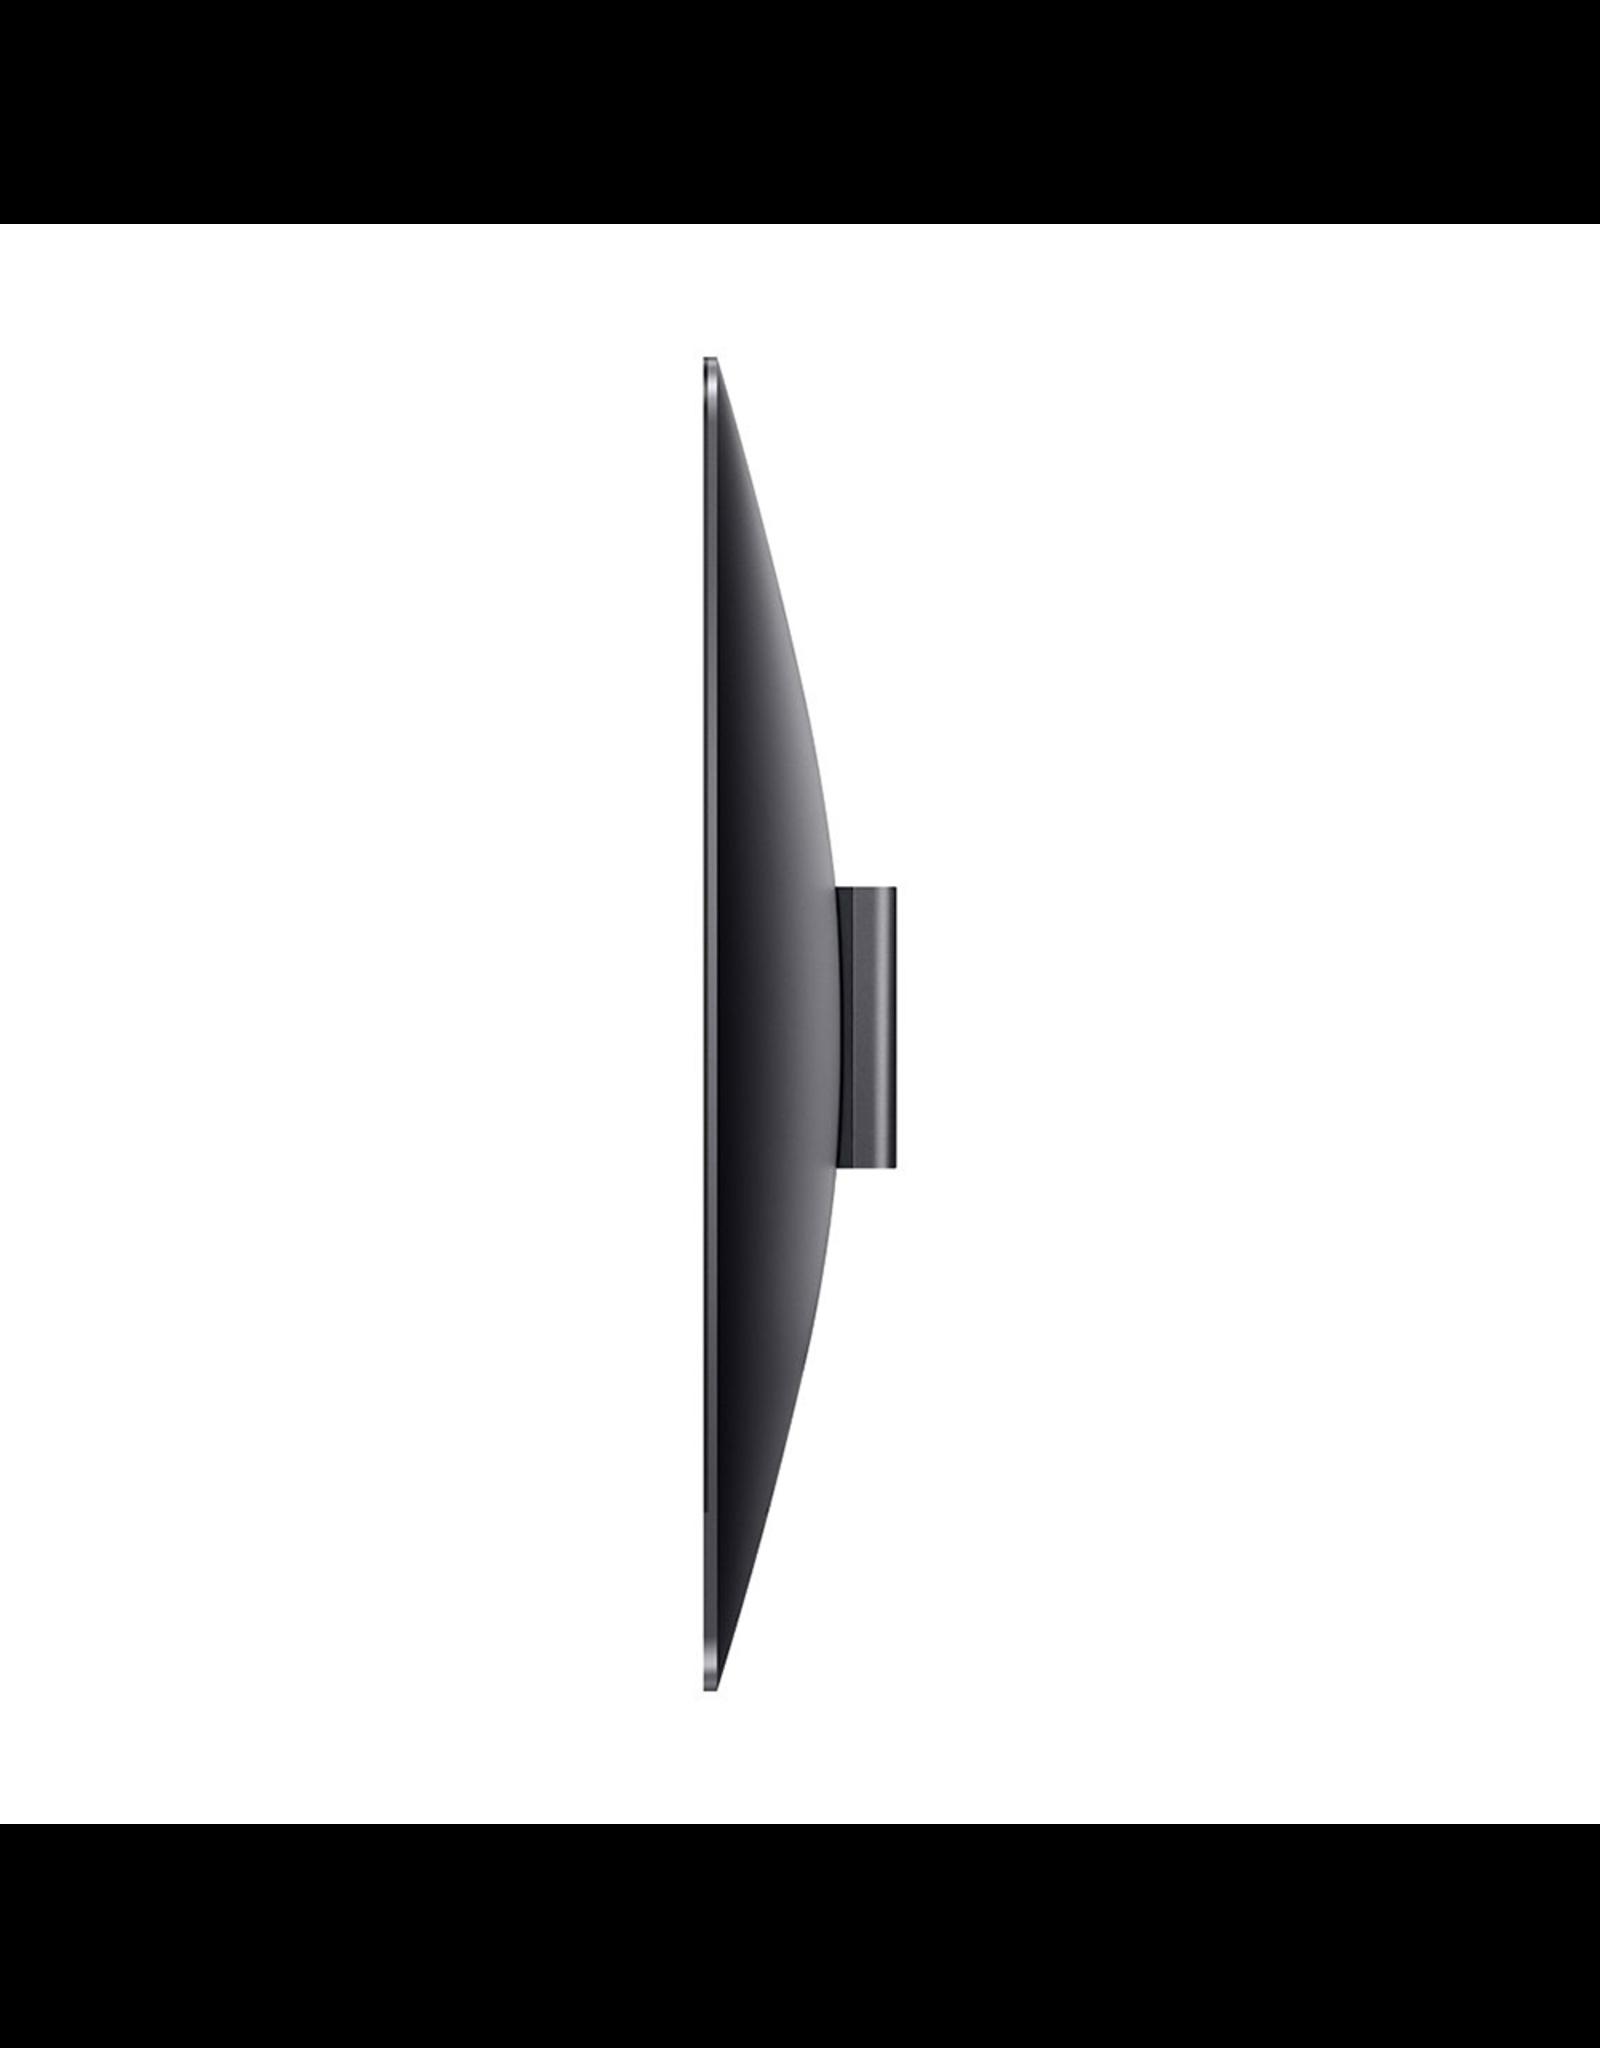 Apple VESA Mount Kit for iMac Pro - Space Grey